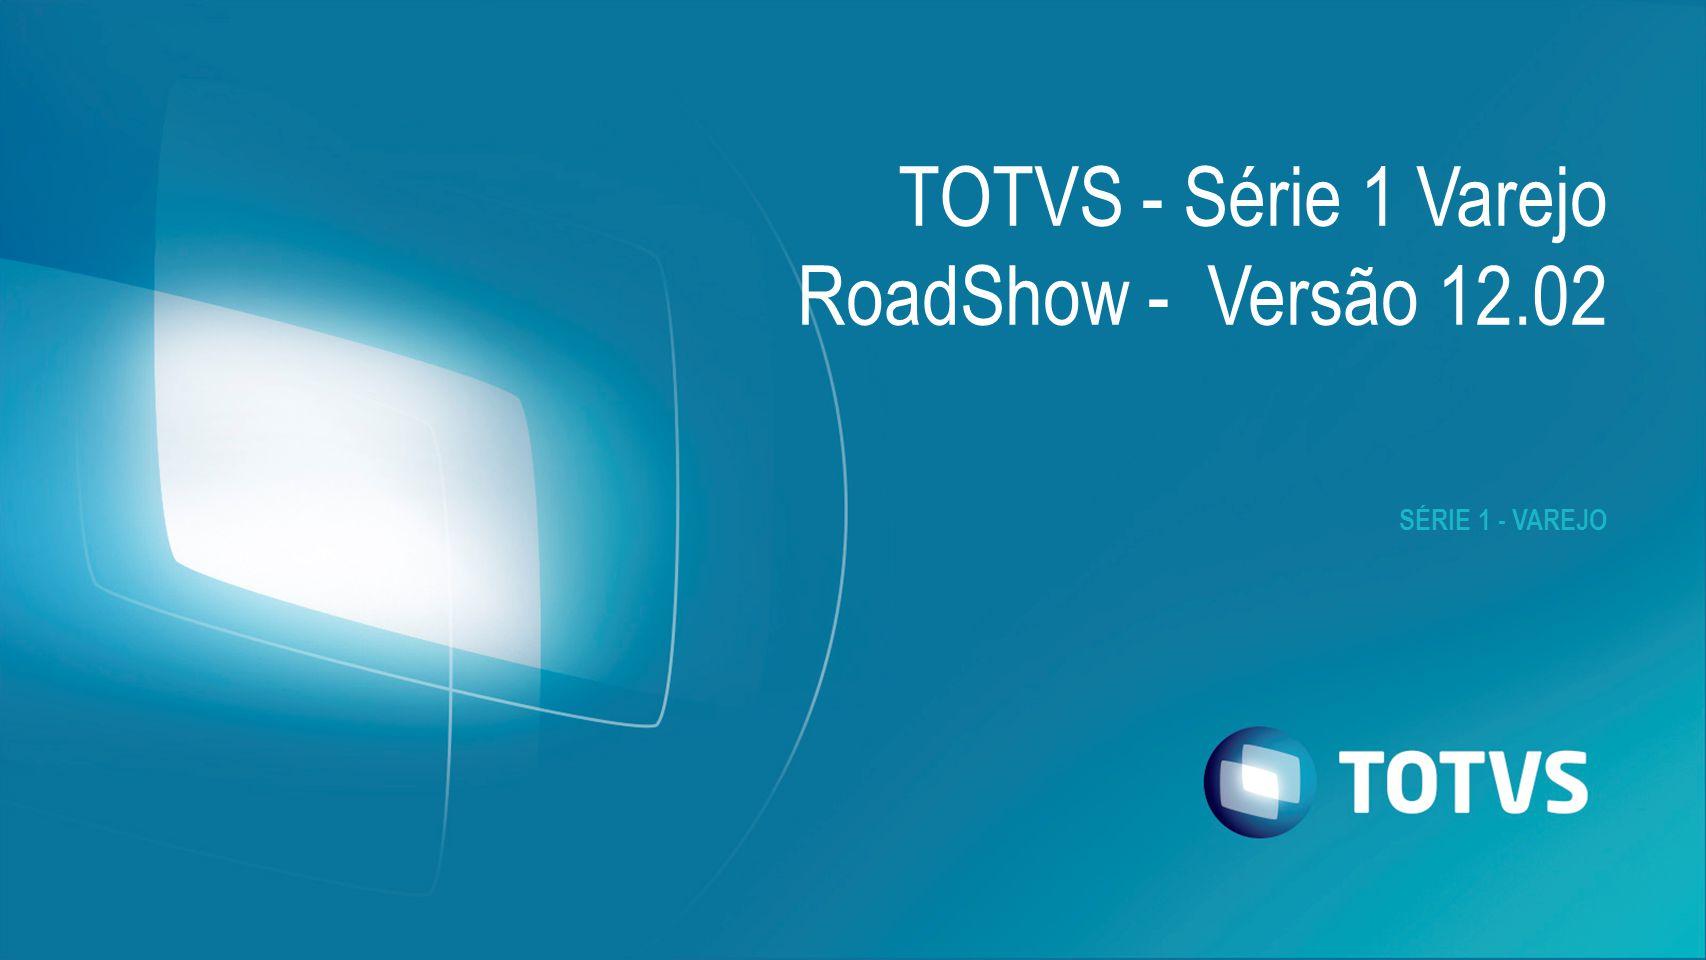 TOTVS - Série 1 Varejo RoadShow - Versão 12.02